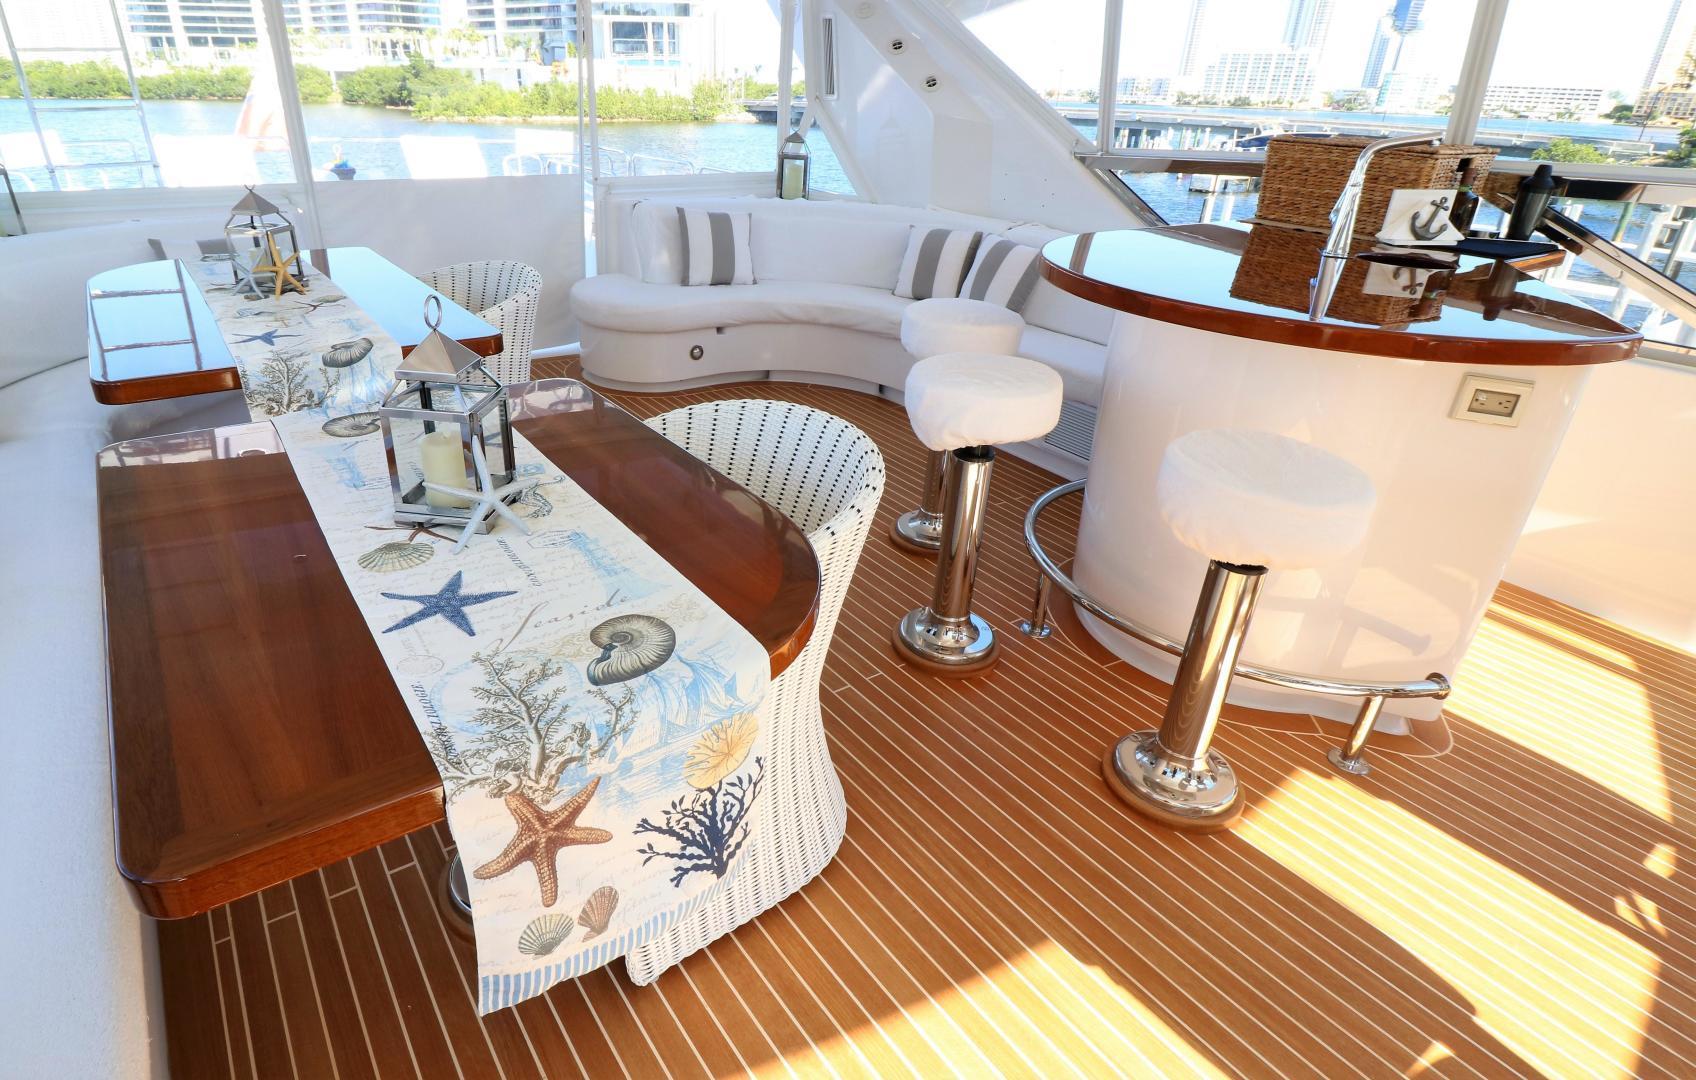 Hatteras-80 Motor Yacht 2015-Daddy Miami-Florida-United States-556298 | Thumbnail